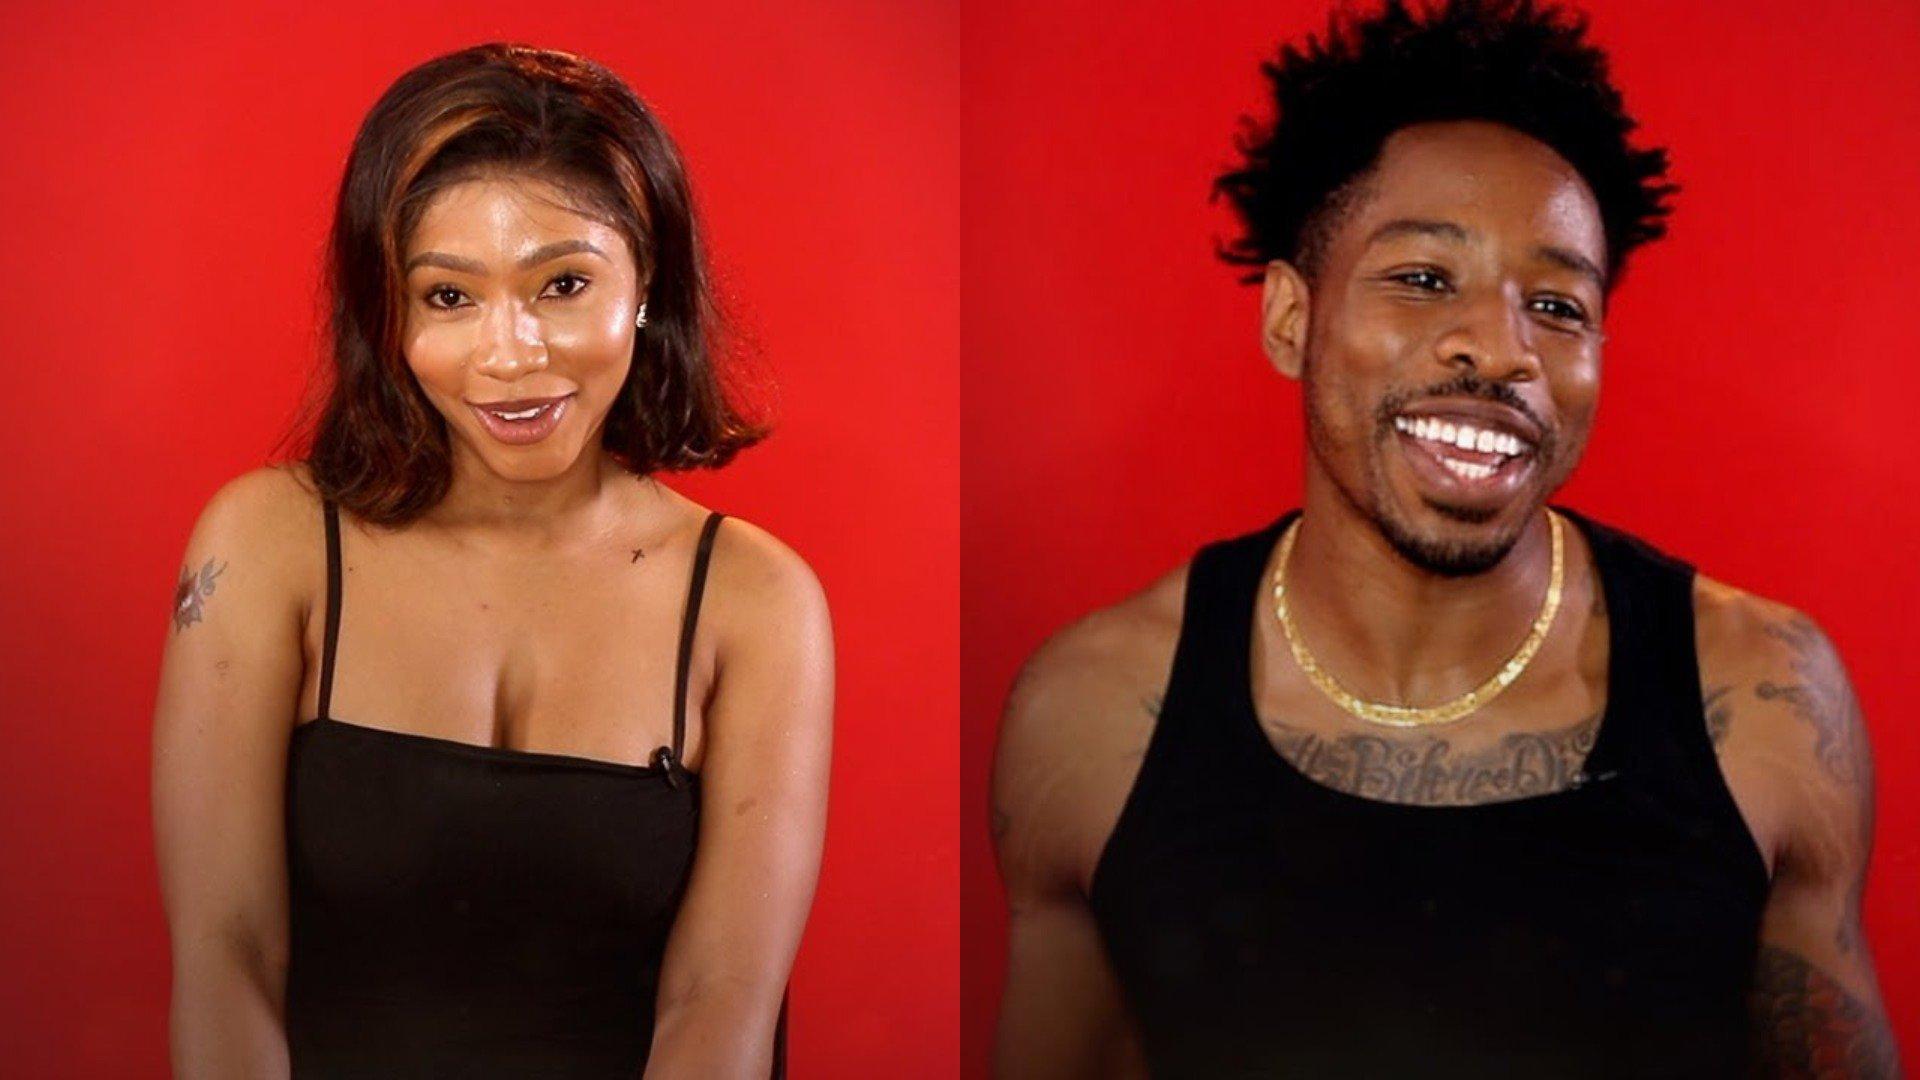 BBNaija 2019 Mercy Ike - 'I Regret Loving You' — Mercy Tells Ike During Heated Misunderstanding (Video)